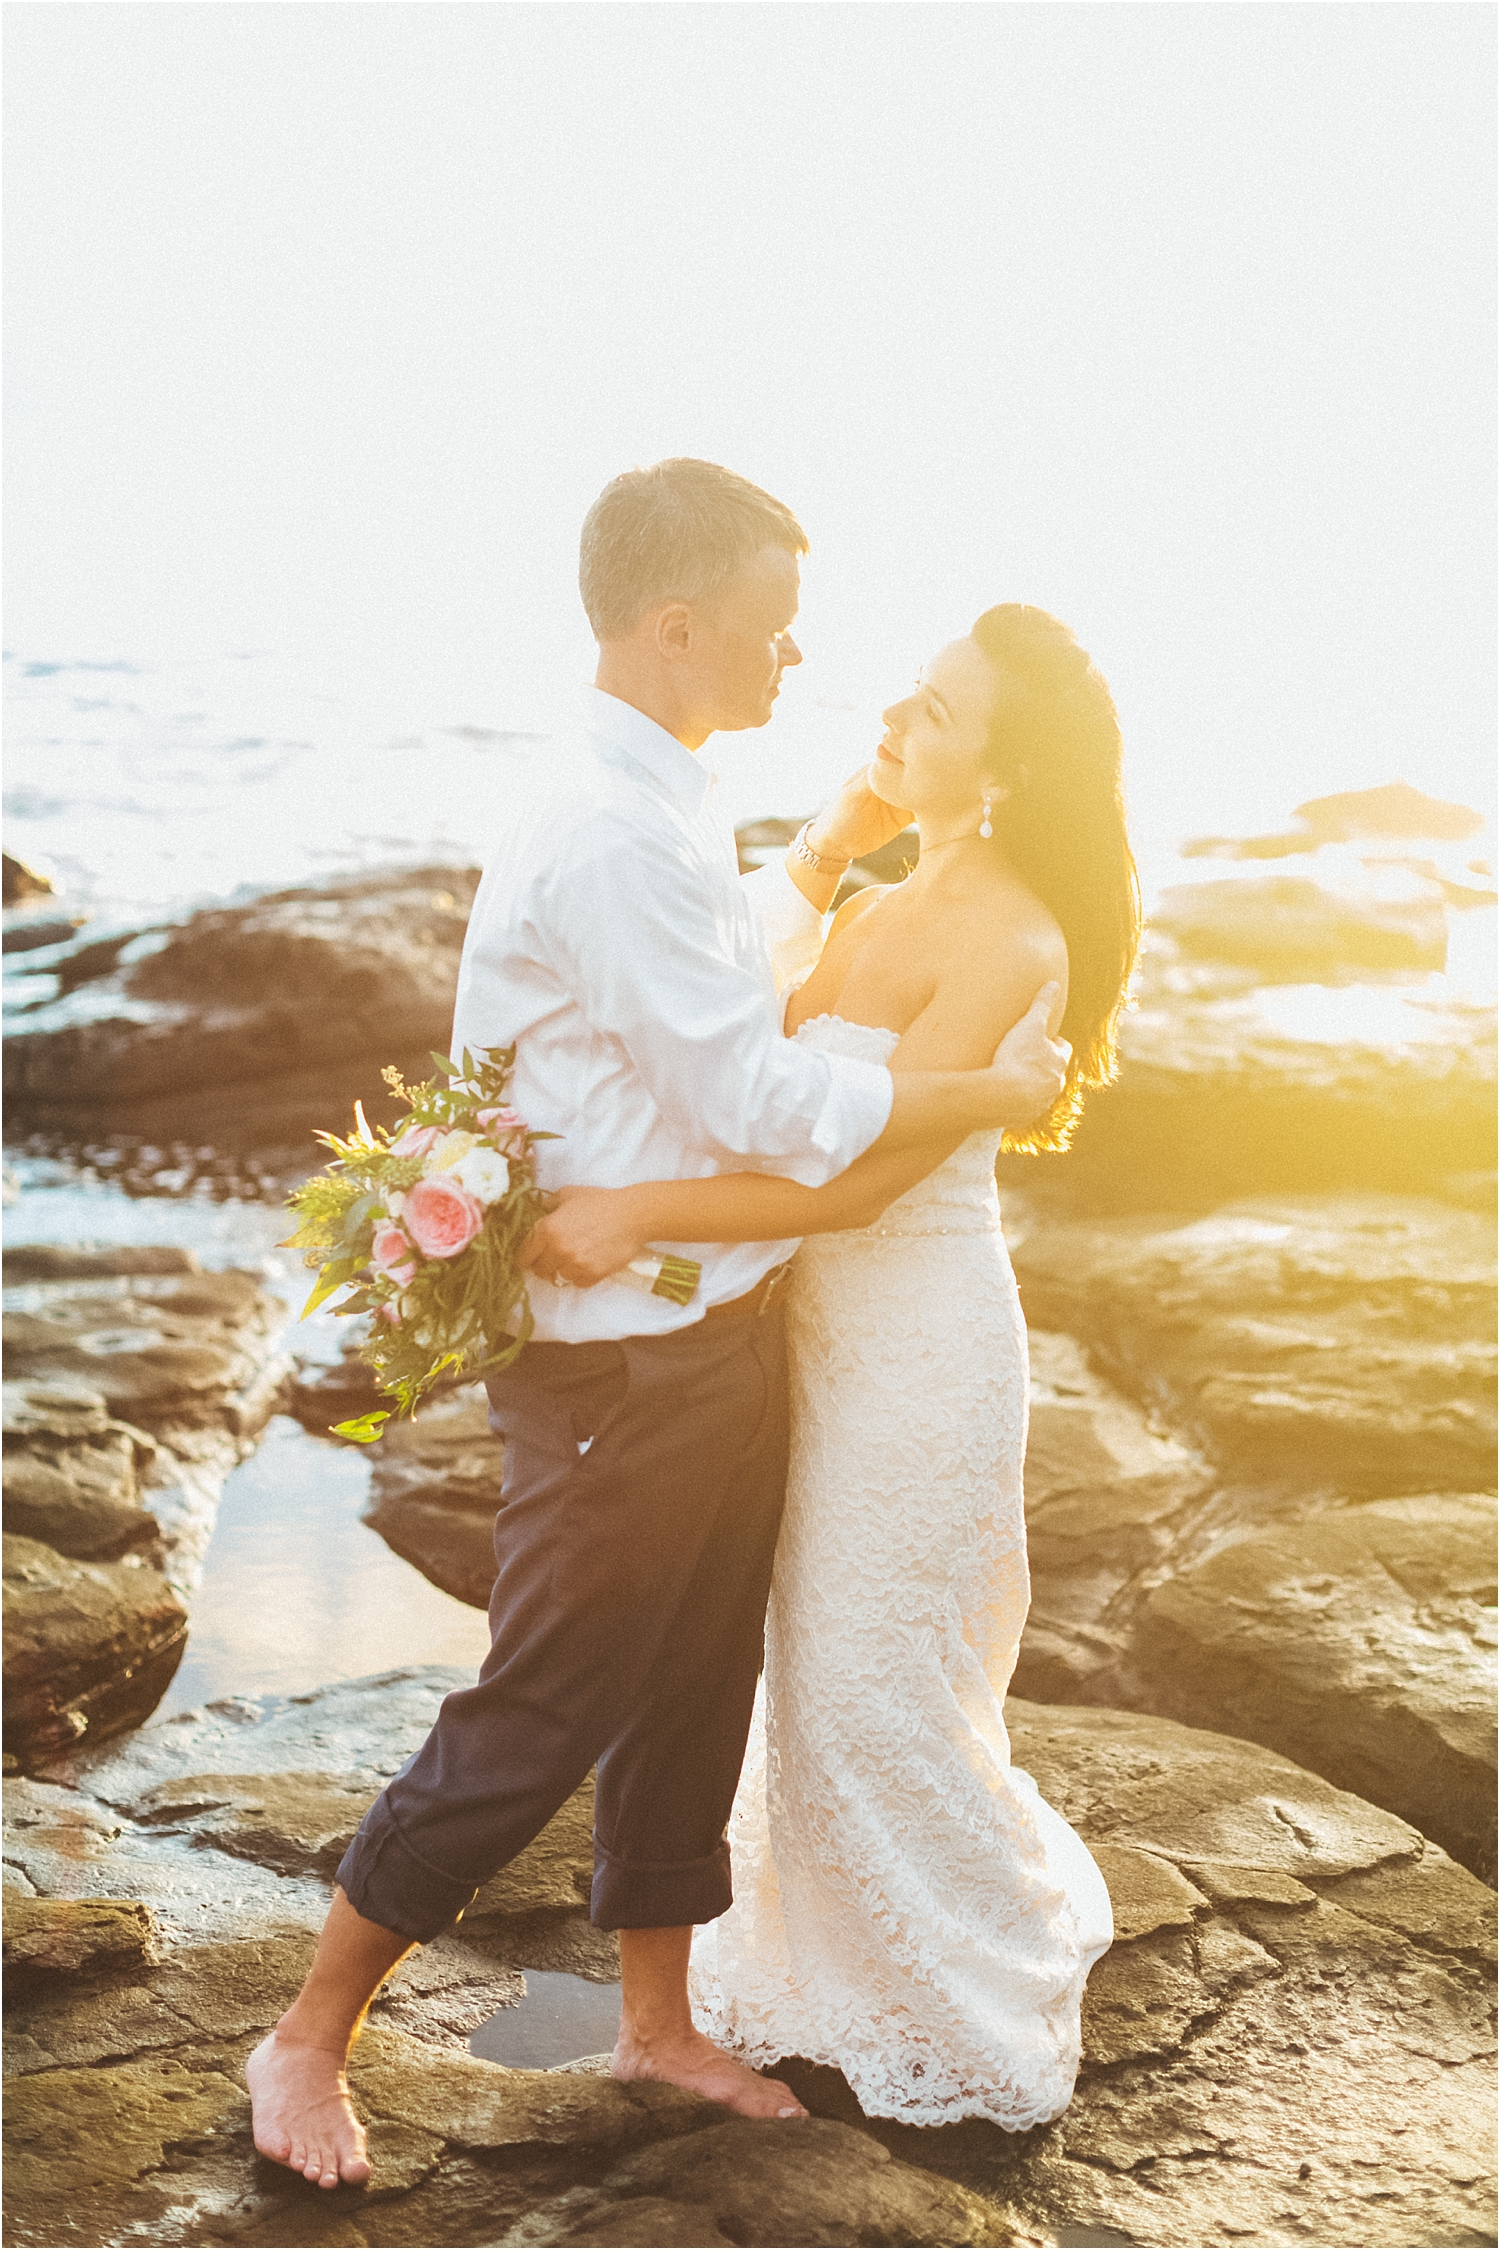 angie-diaz-photography-maui-wedding-ironwoods-beach_0052.jpg